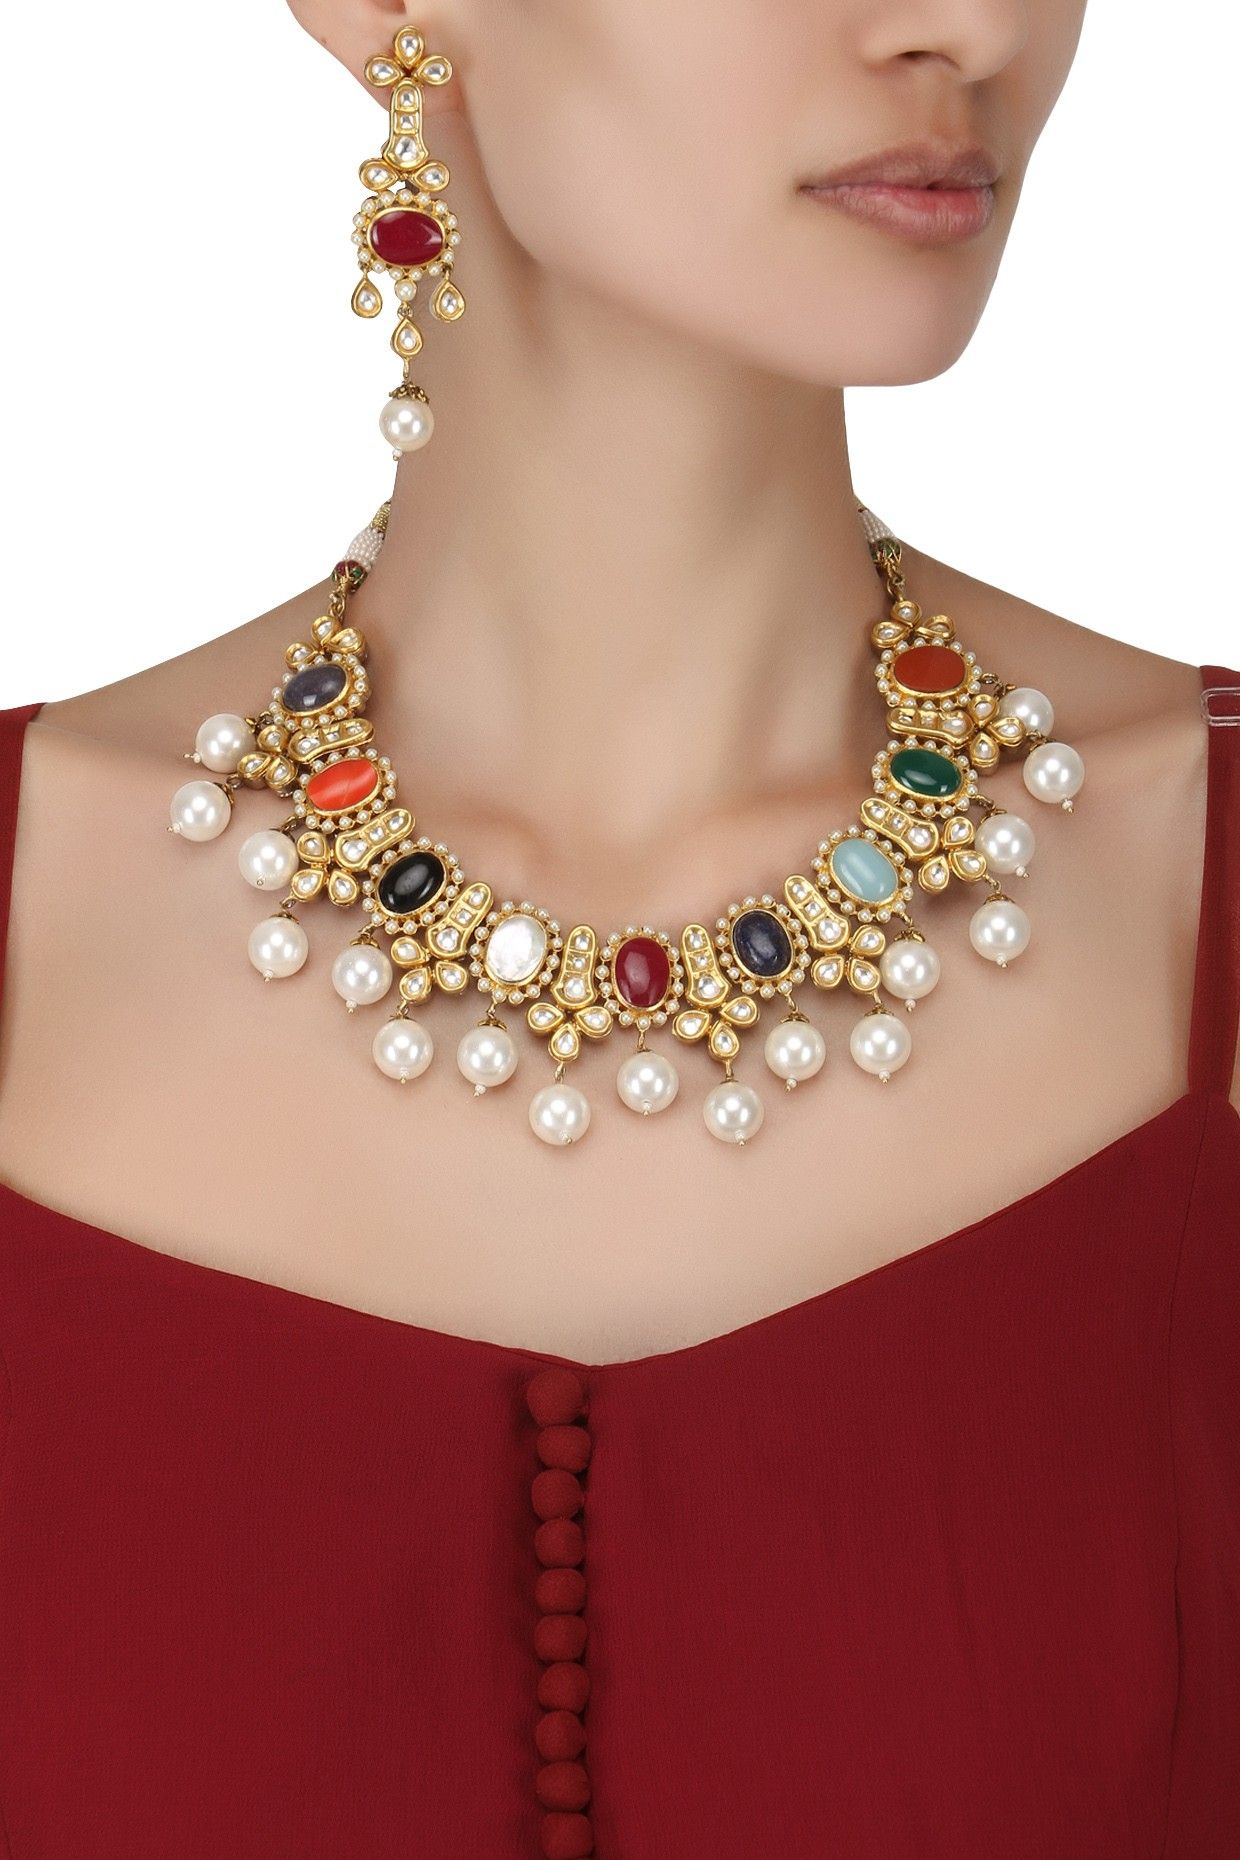 Auraa trends gold finish kundan and pearls navratna necklace set